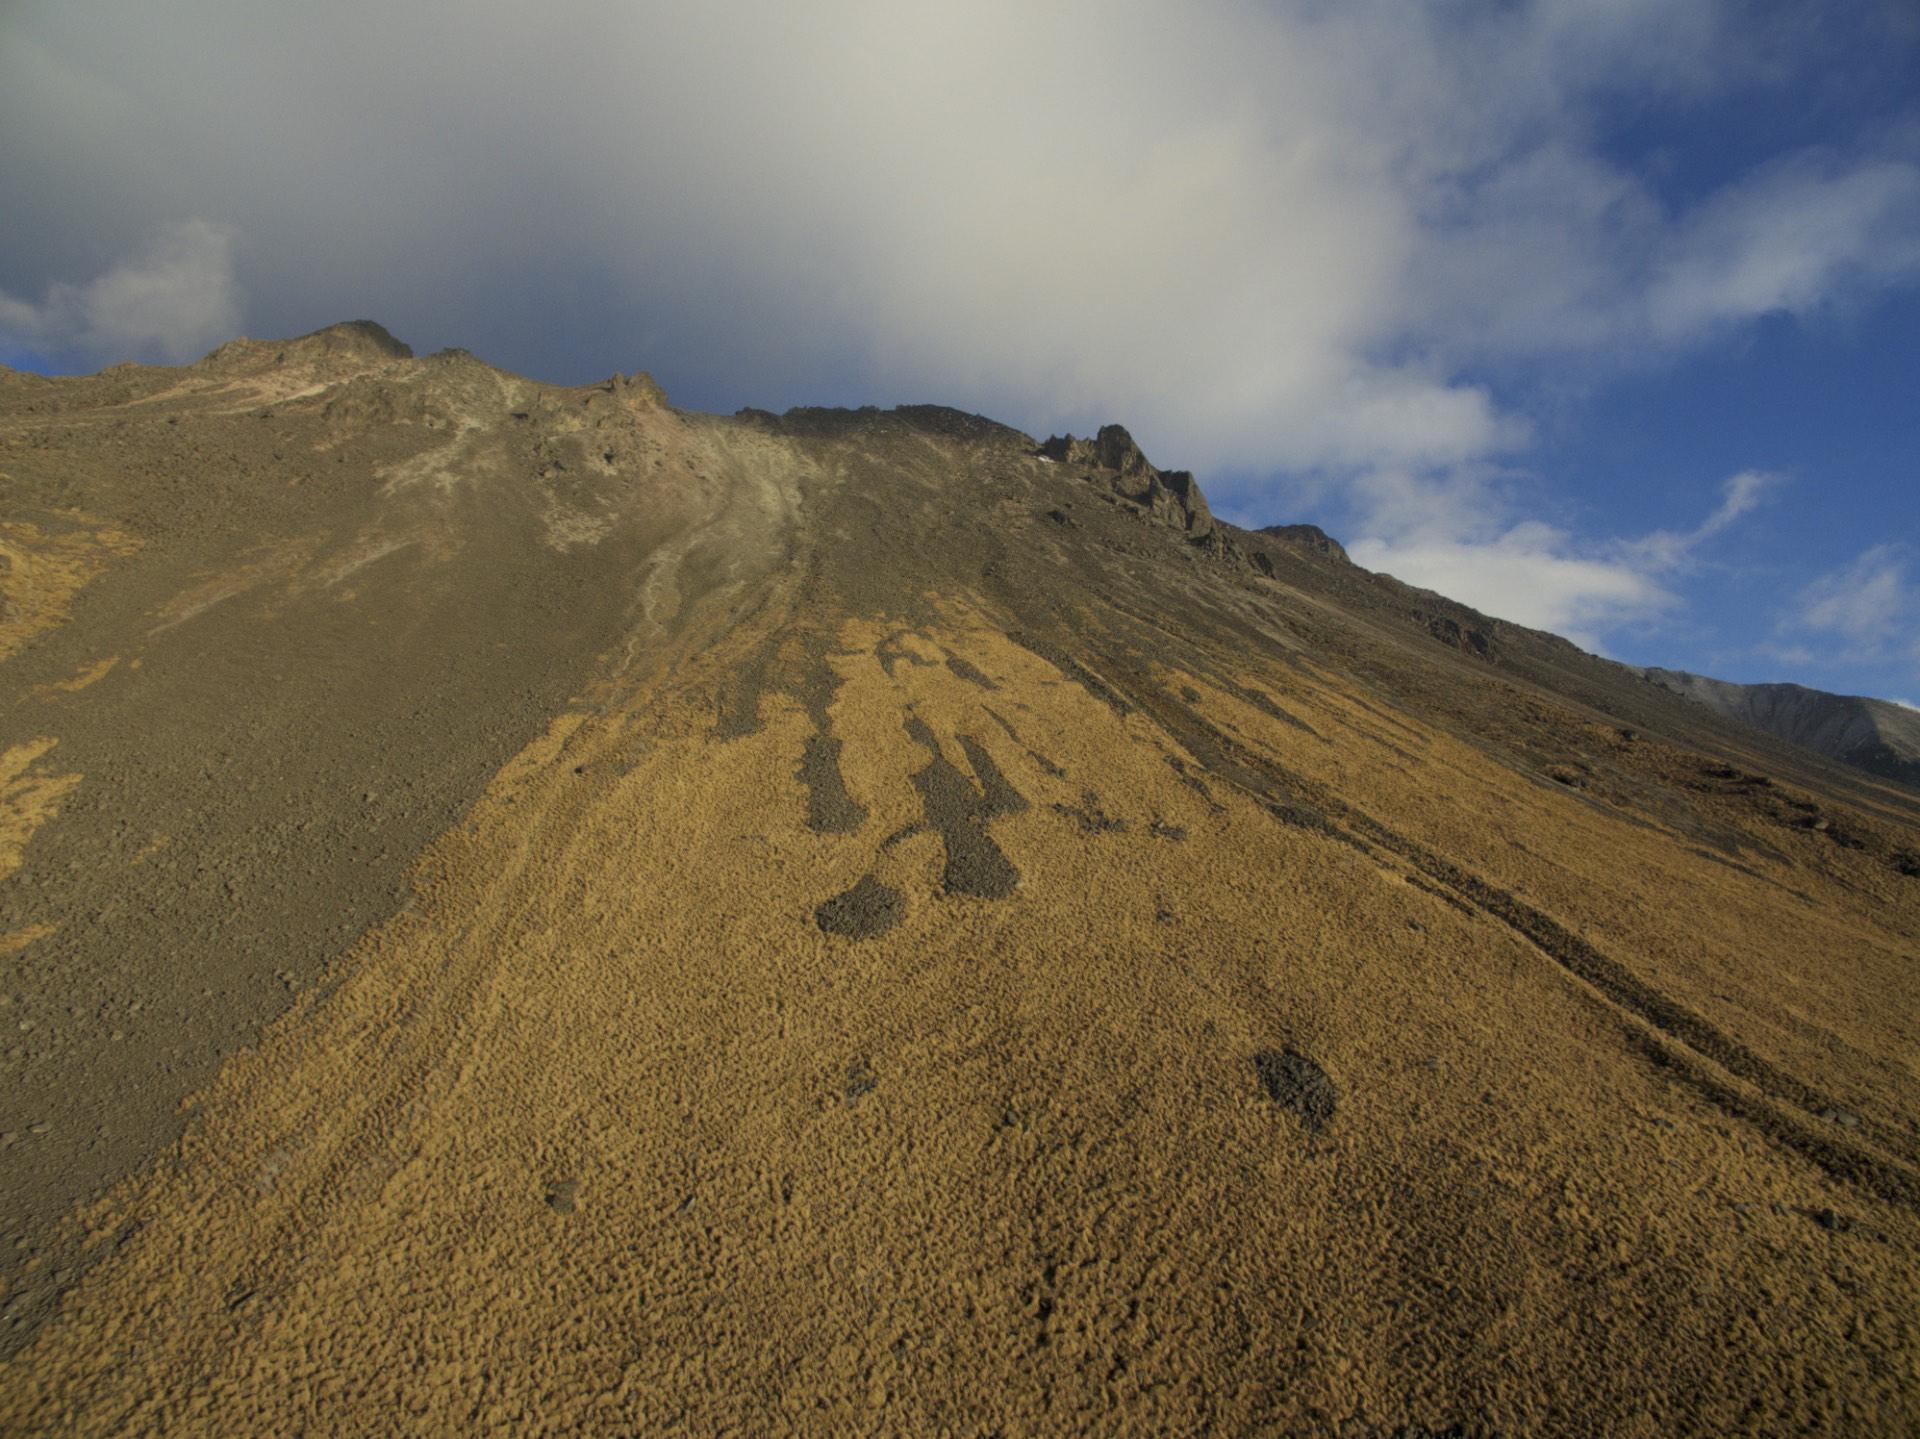 Nevado of Toluca, fourth highest volcanoe in Mexico.